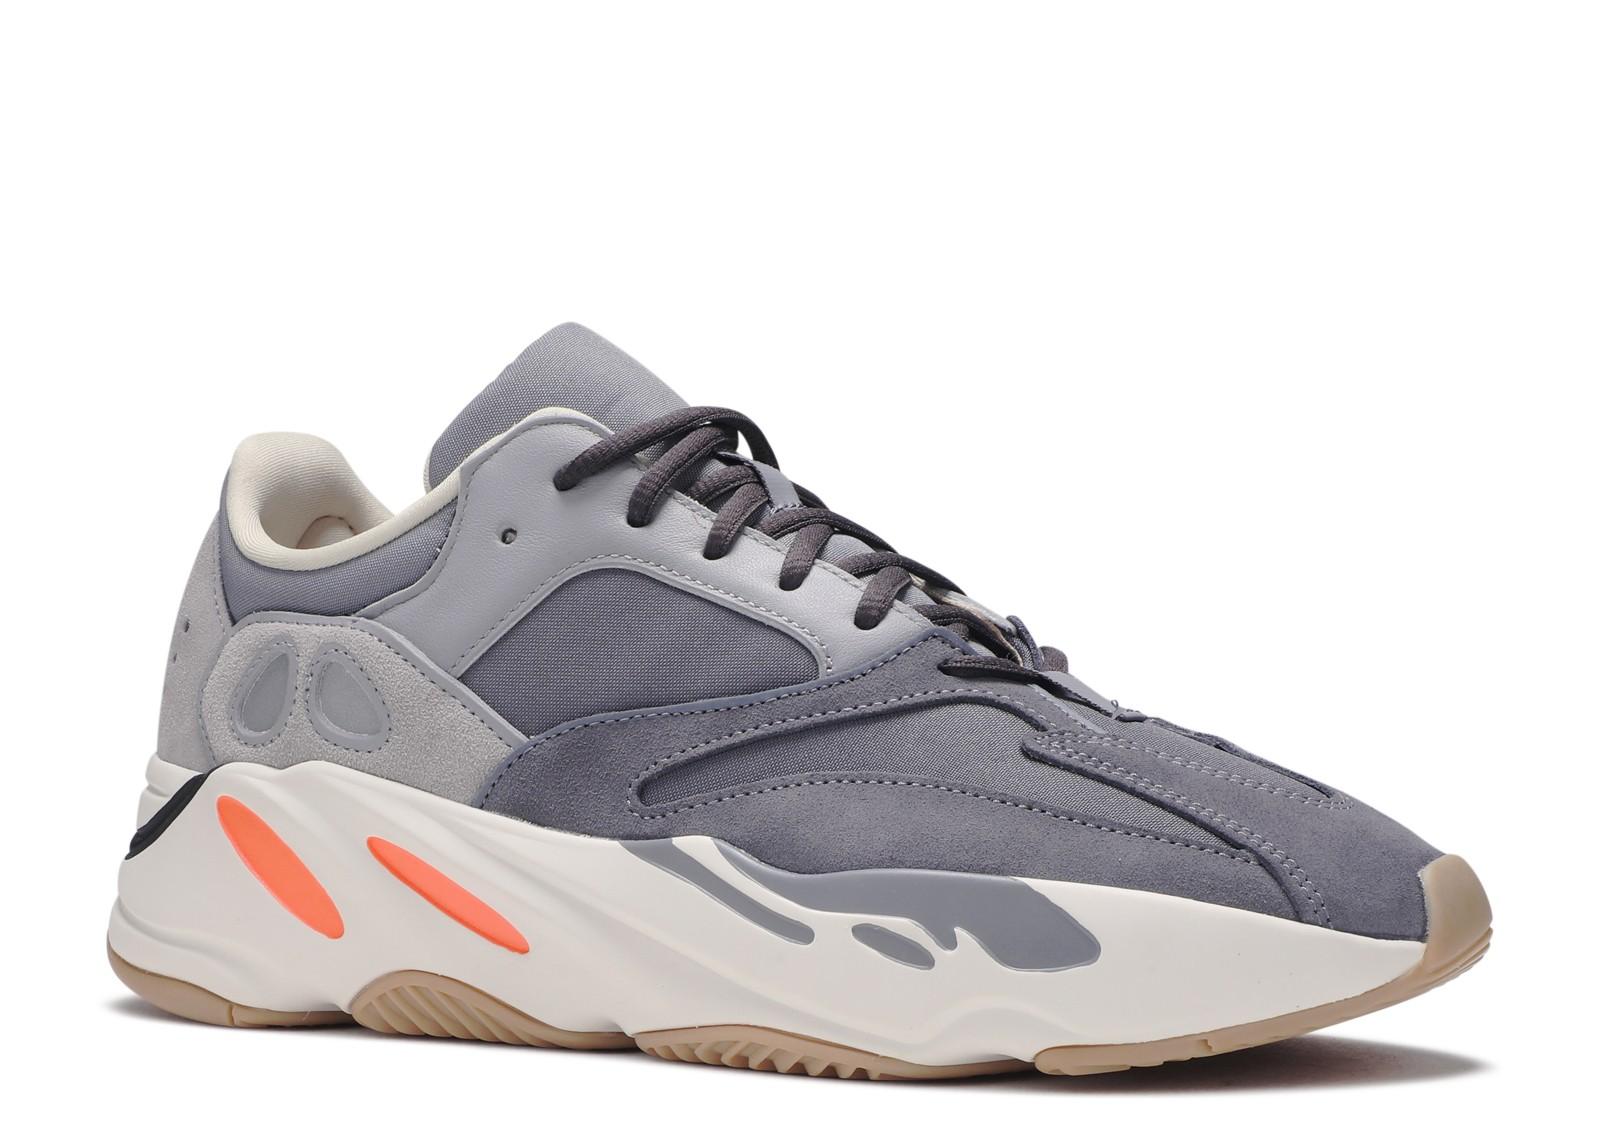 Adidas Yeezy 700 Inertia - kickstw